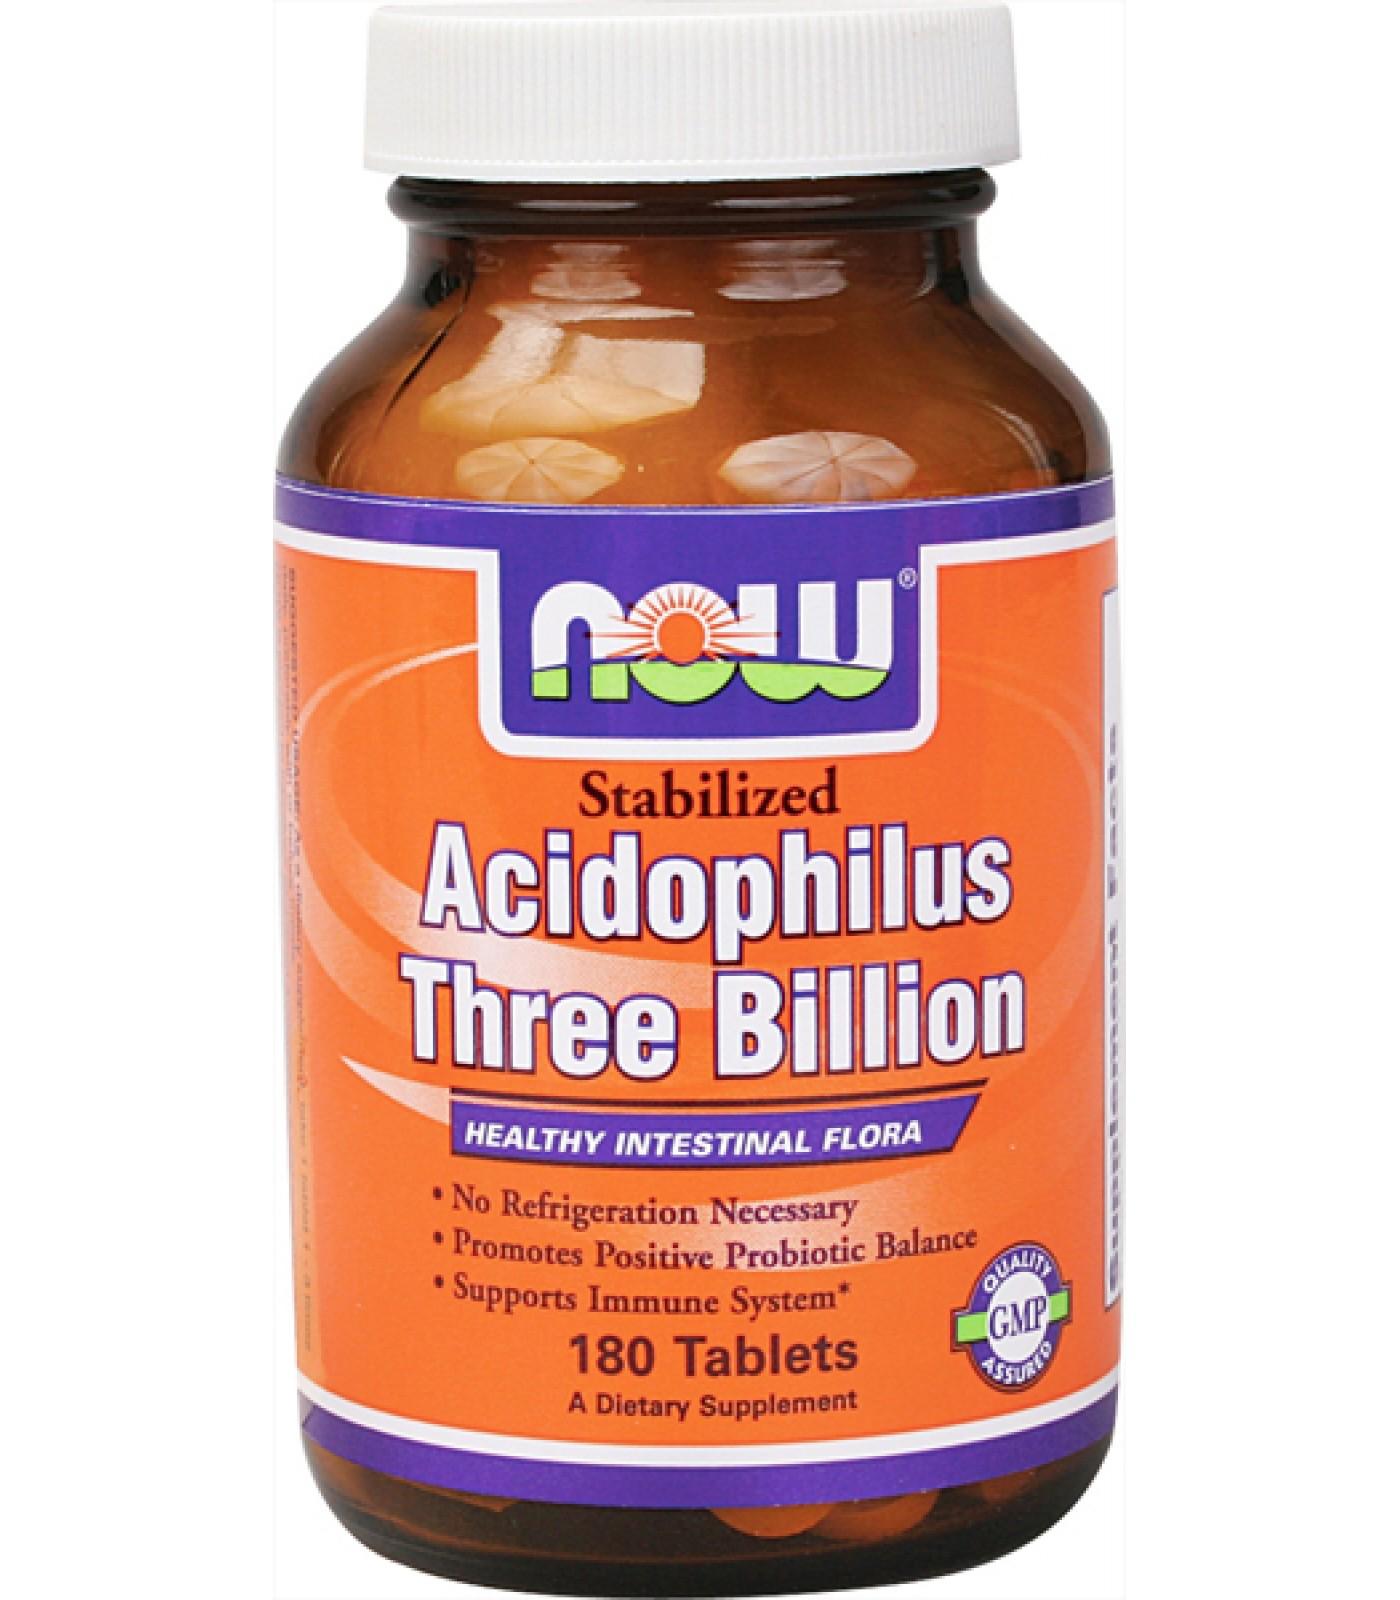 NOW - Stabilized Acidophilus Three Billion / 90 Tablets